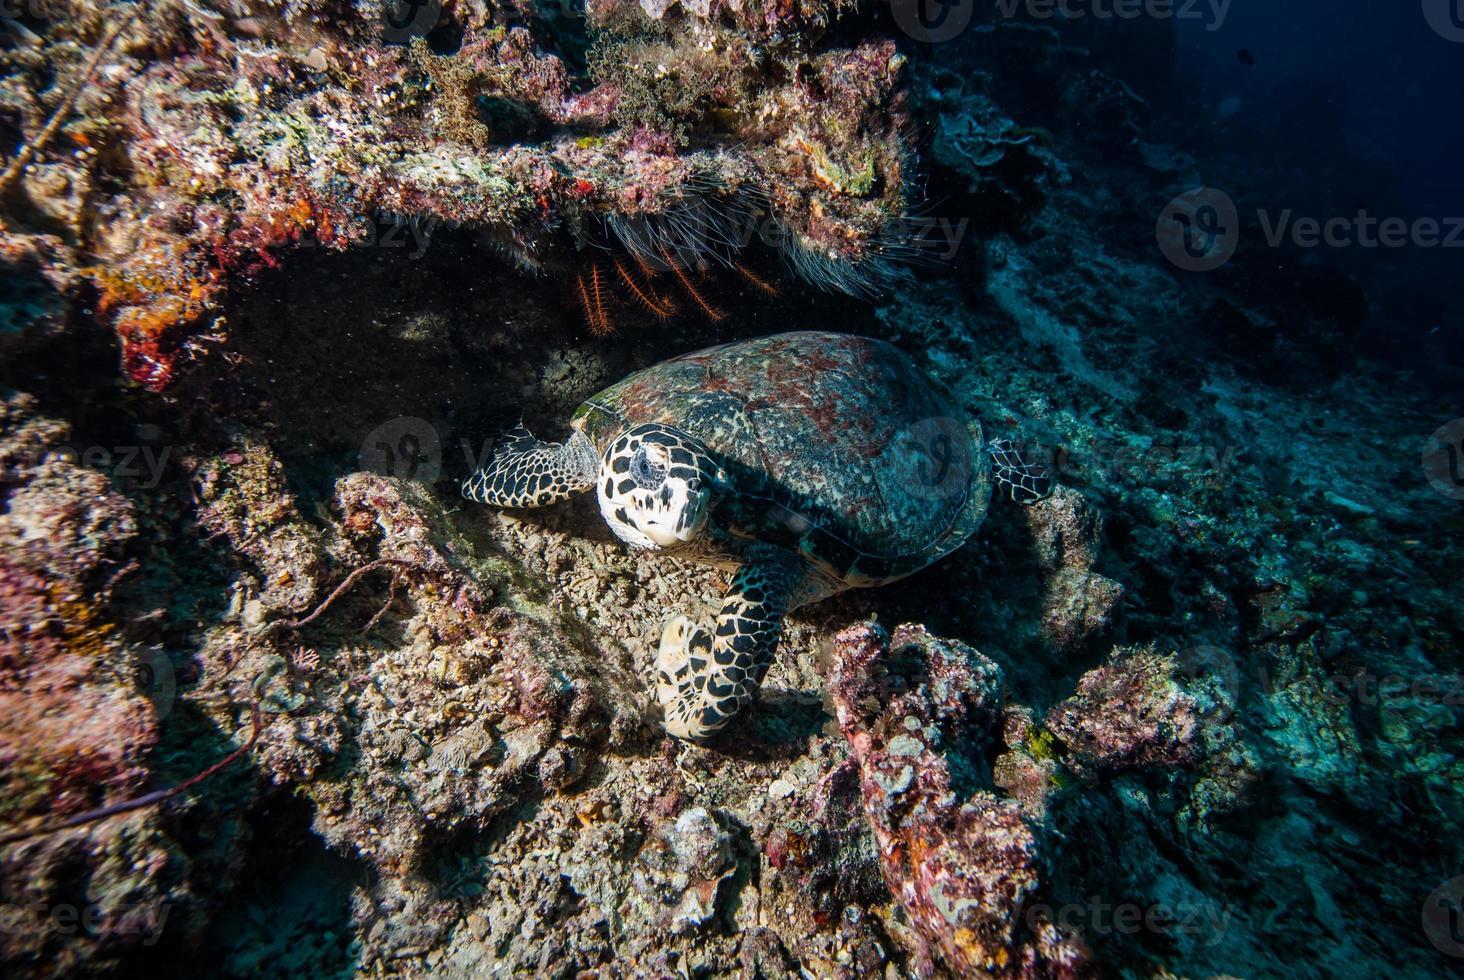 tartaruga verde nadando em foto subaquática de derawan, kalimantan, indonésia